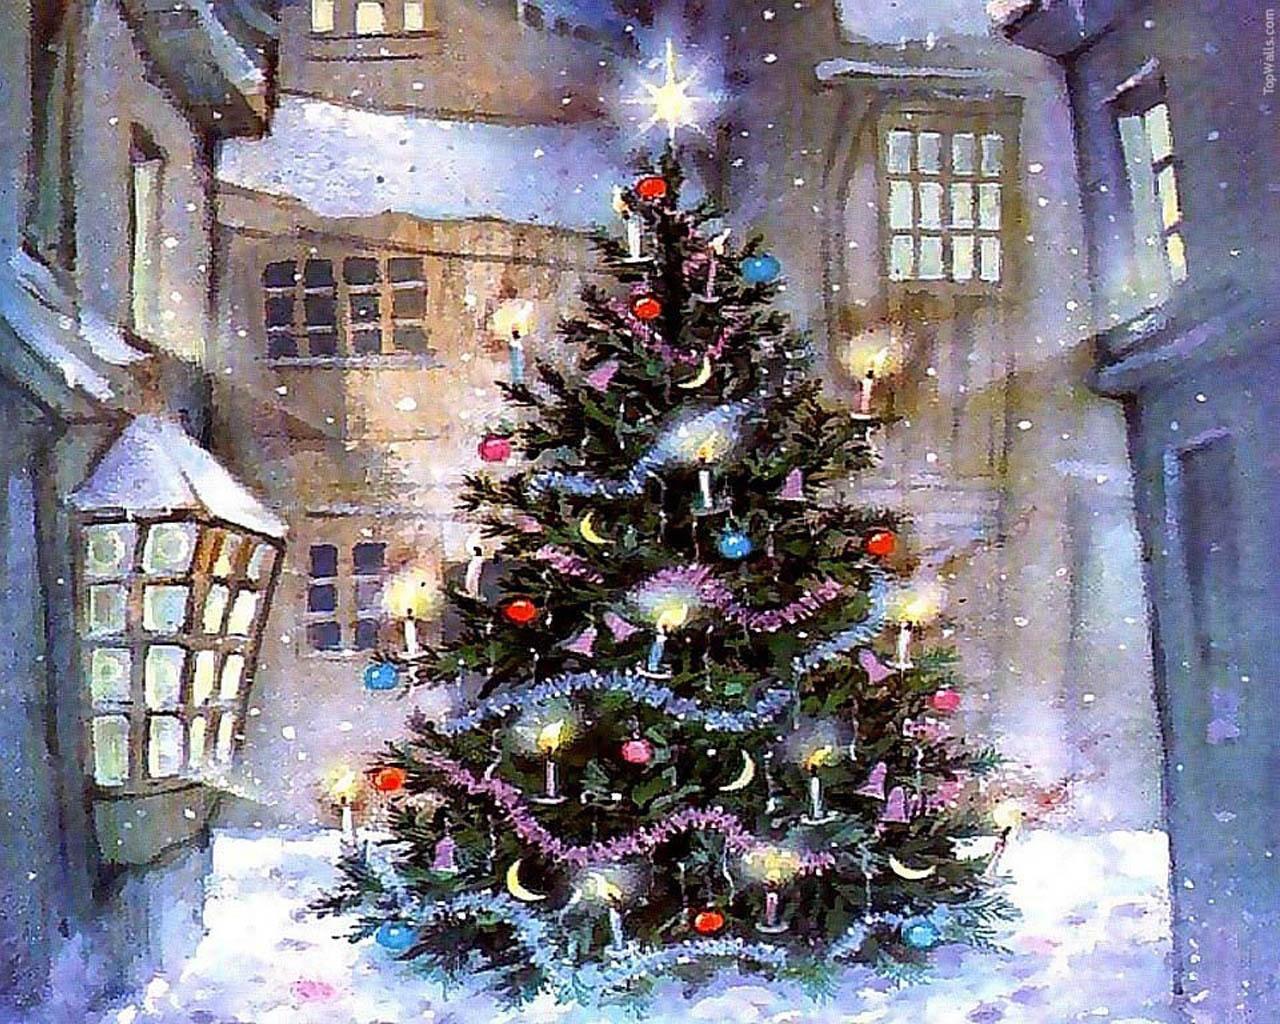 1280x1024 Christmas tree inside desktop PC and Mac wallpaper 1280x1024